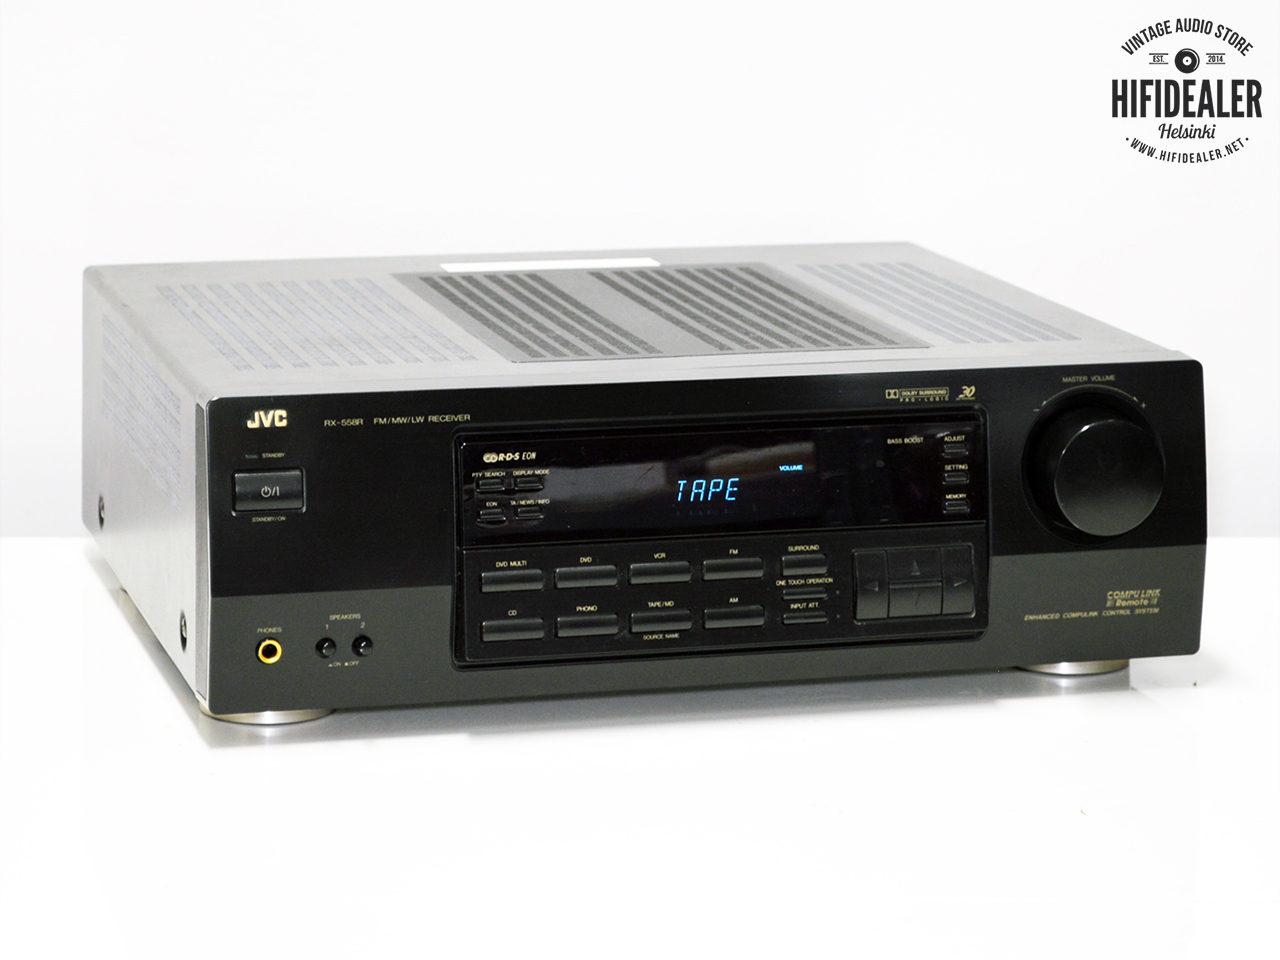 jvc-rx-558r